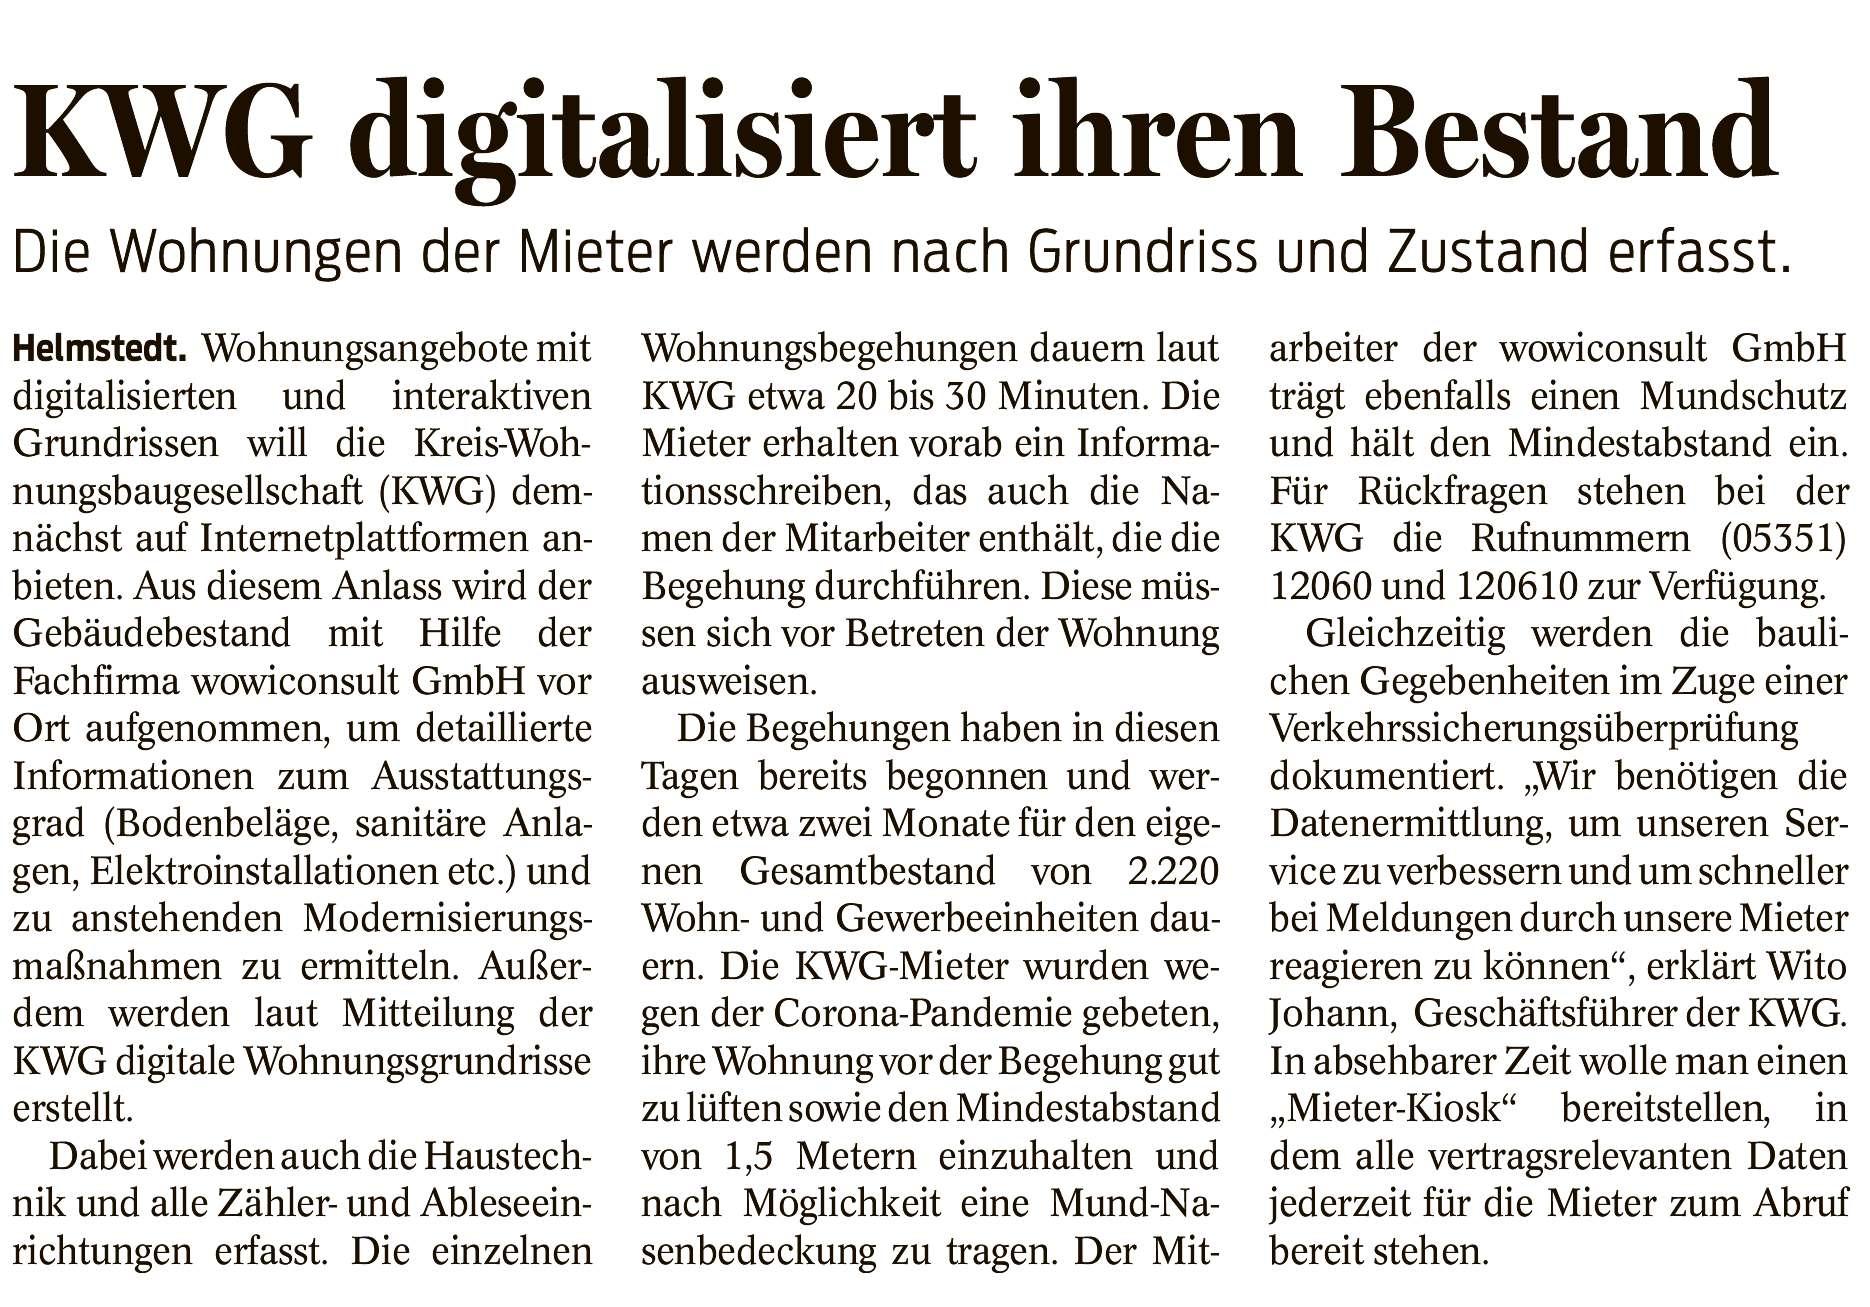 https://www.kwg-helmstedt.de/media/KWG_BS_Zeitung_Digitalisierung_vom_15-06-2020.jpg